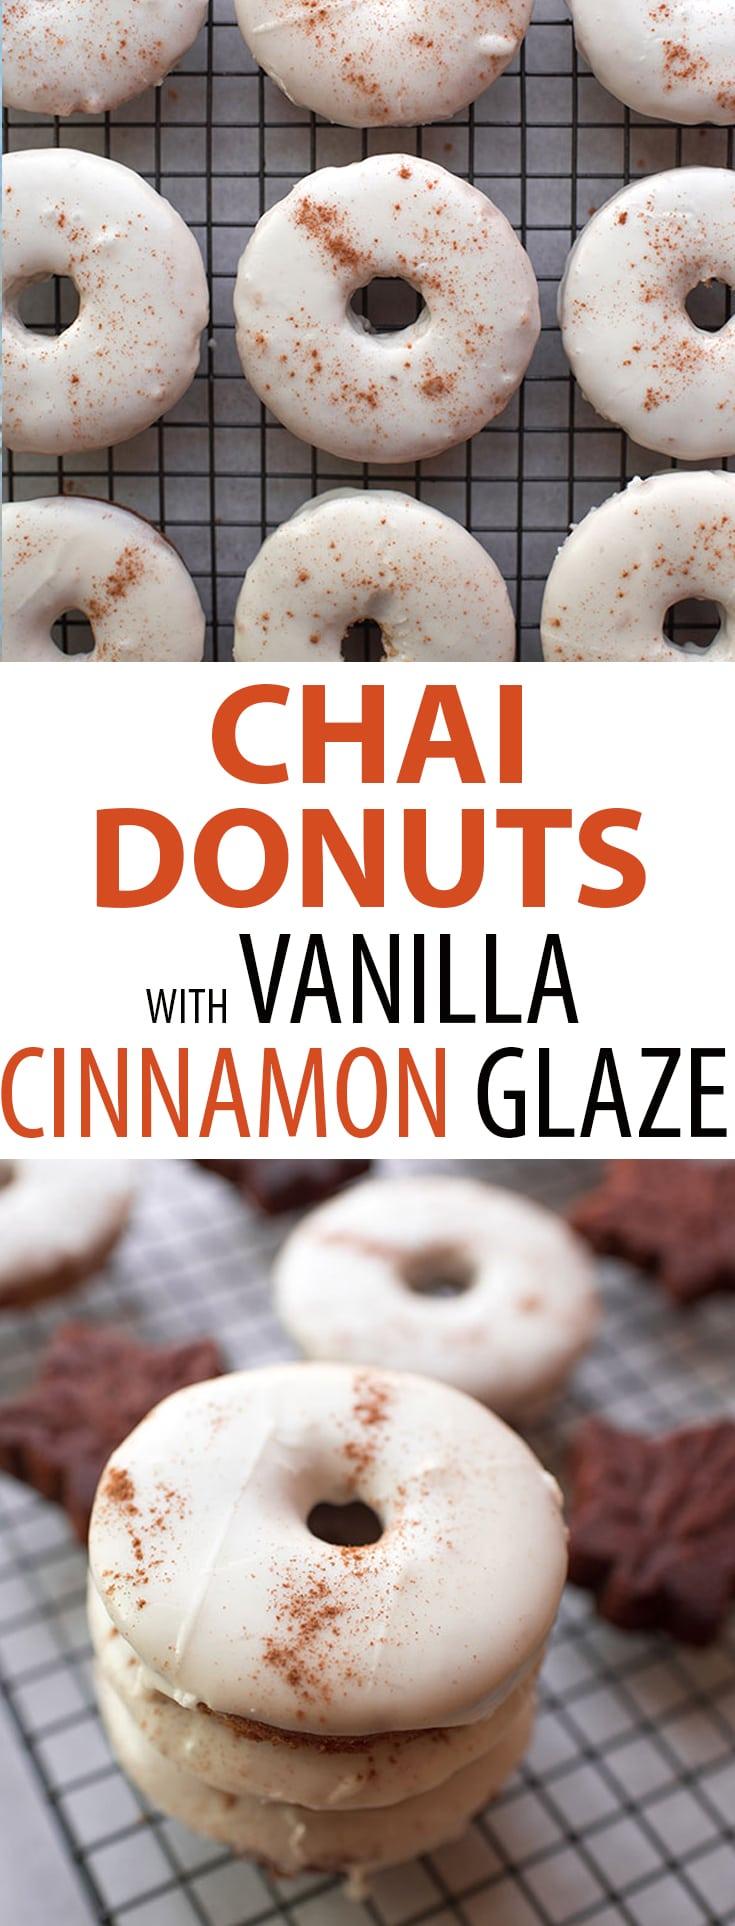 Chai Baked Donuts with Vanilla Cinnamon Glaze